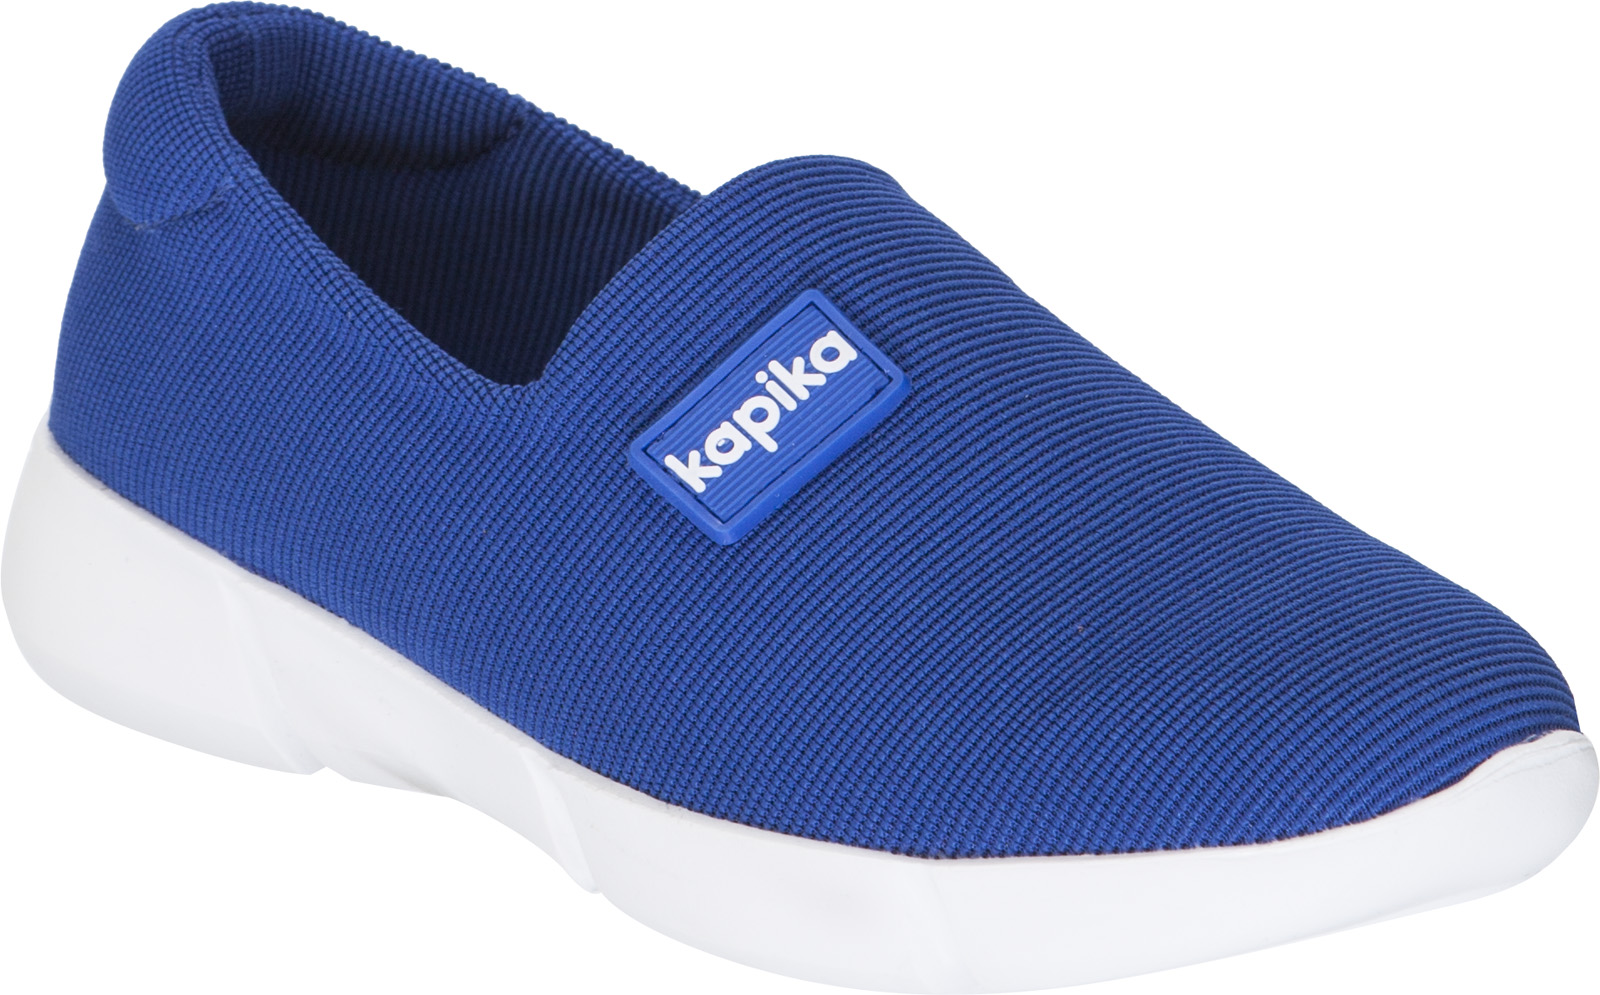 Кроссовки для девочки Kapika, цвет: синий. 73276-4. Размер 3273276-4